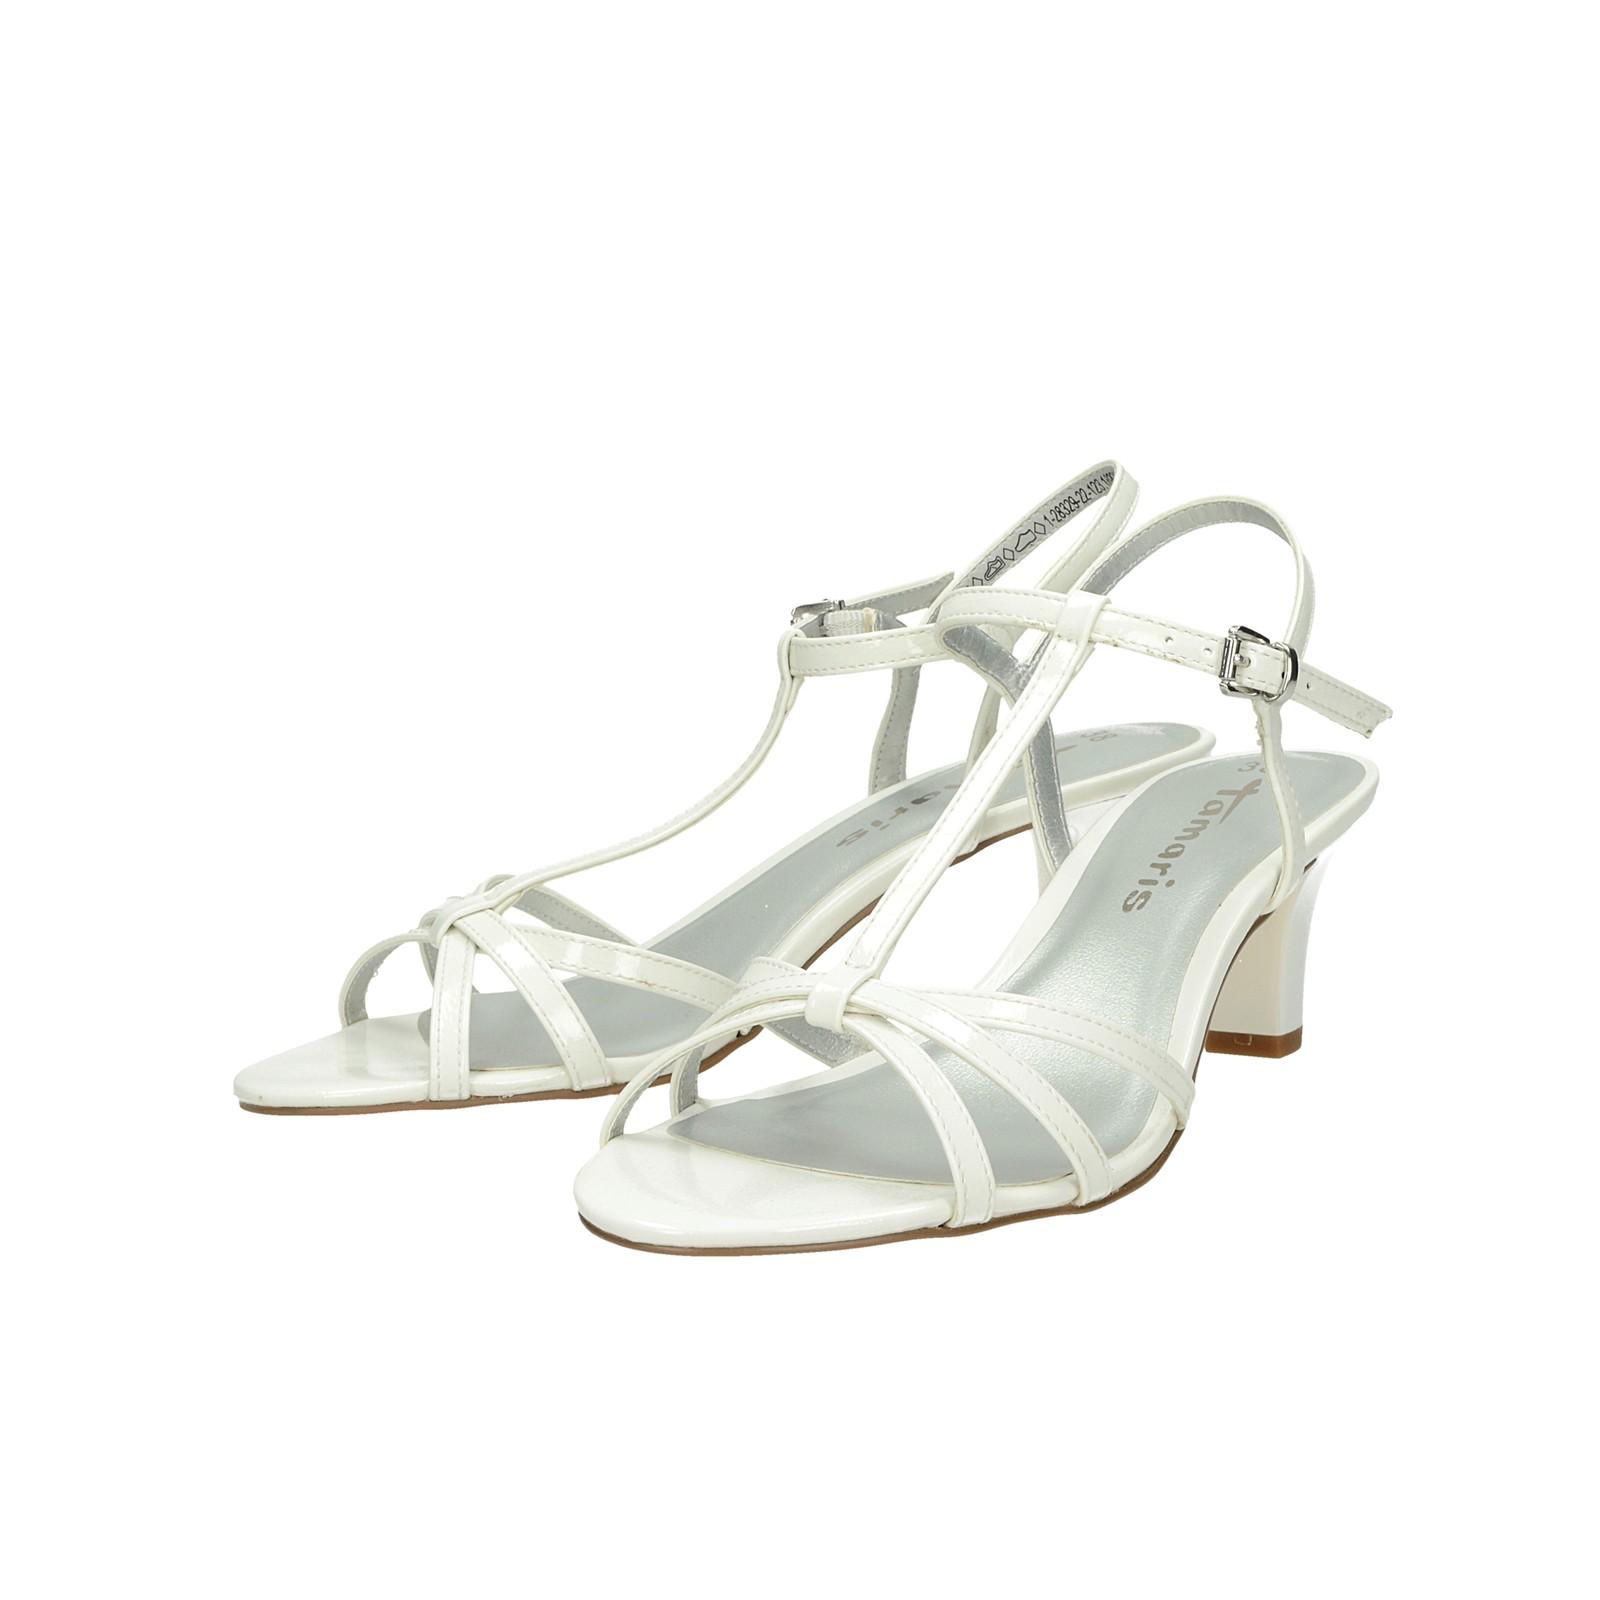 39f3c233ff82 Tamaris dámske štýlové sandále - biele ...